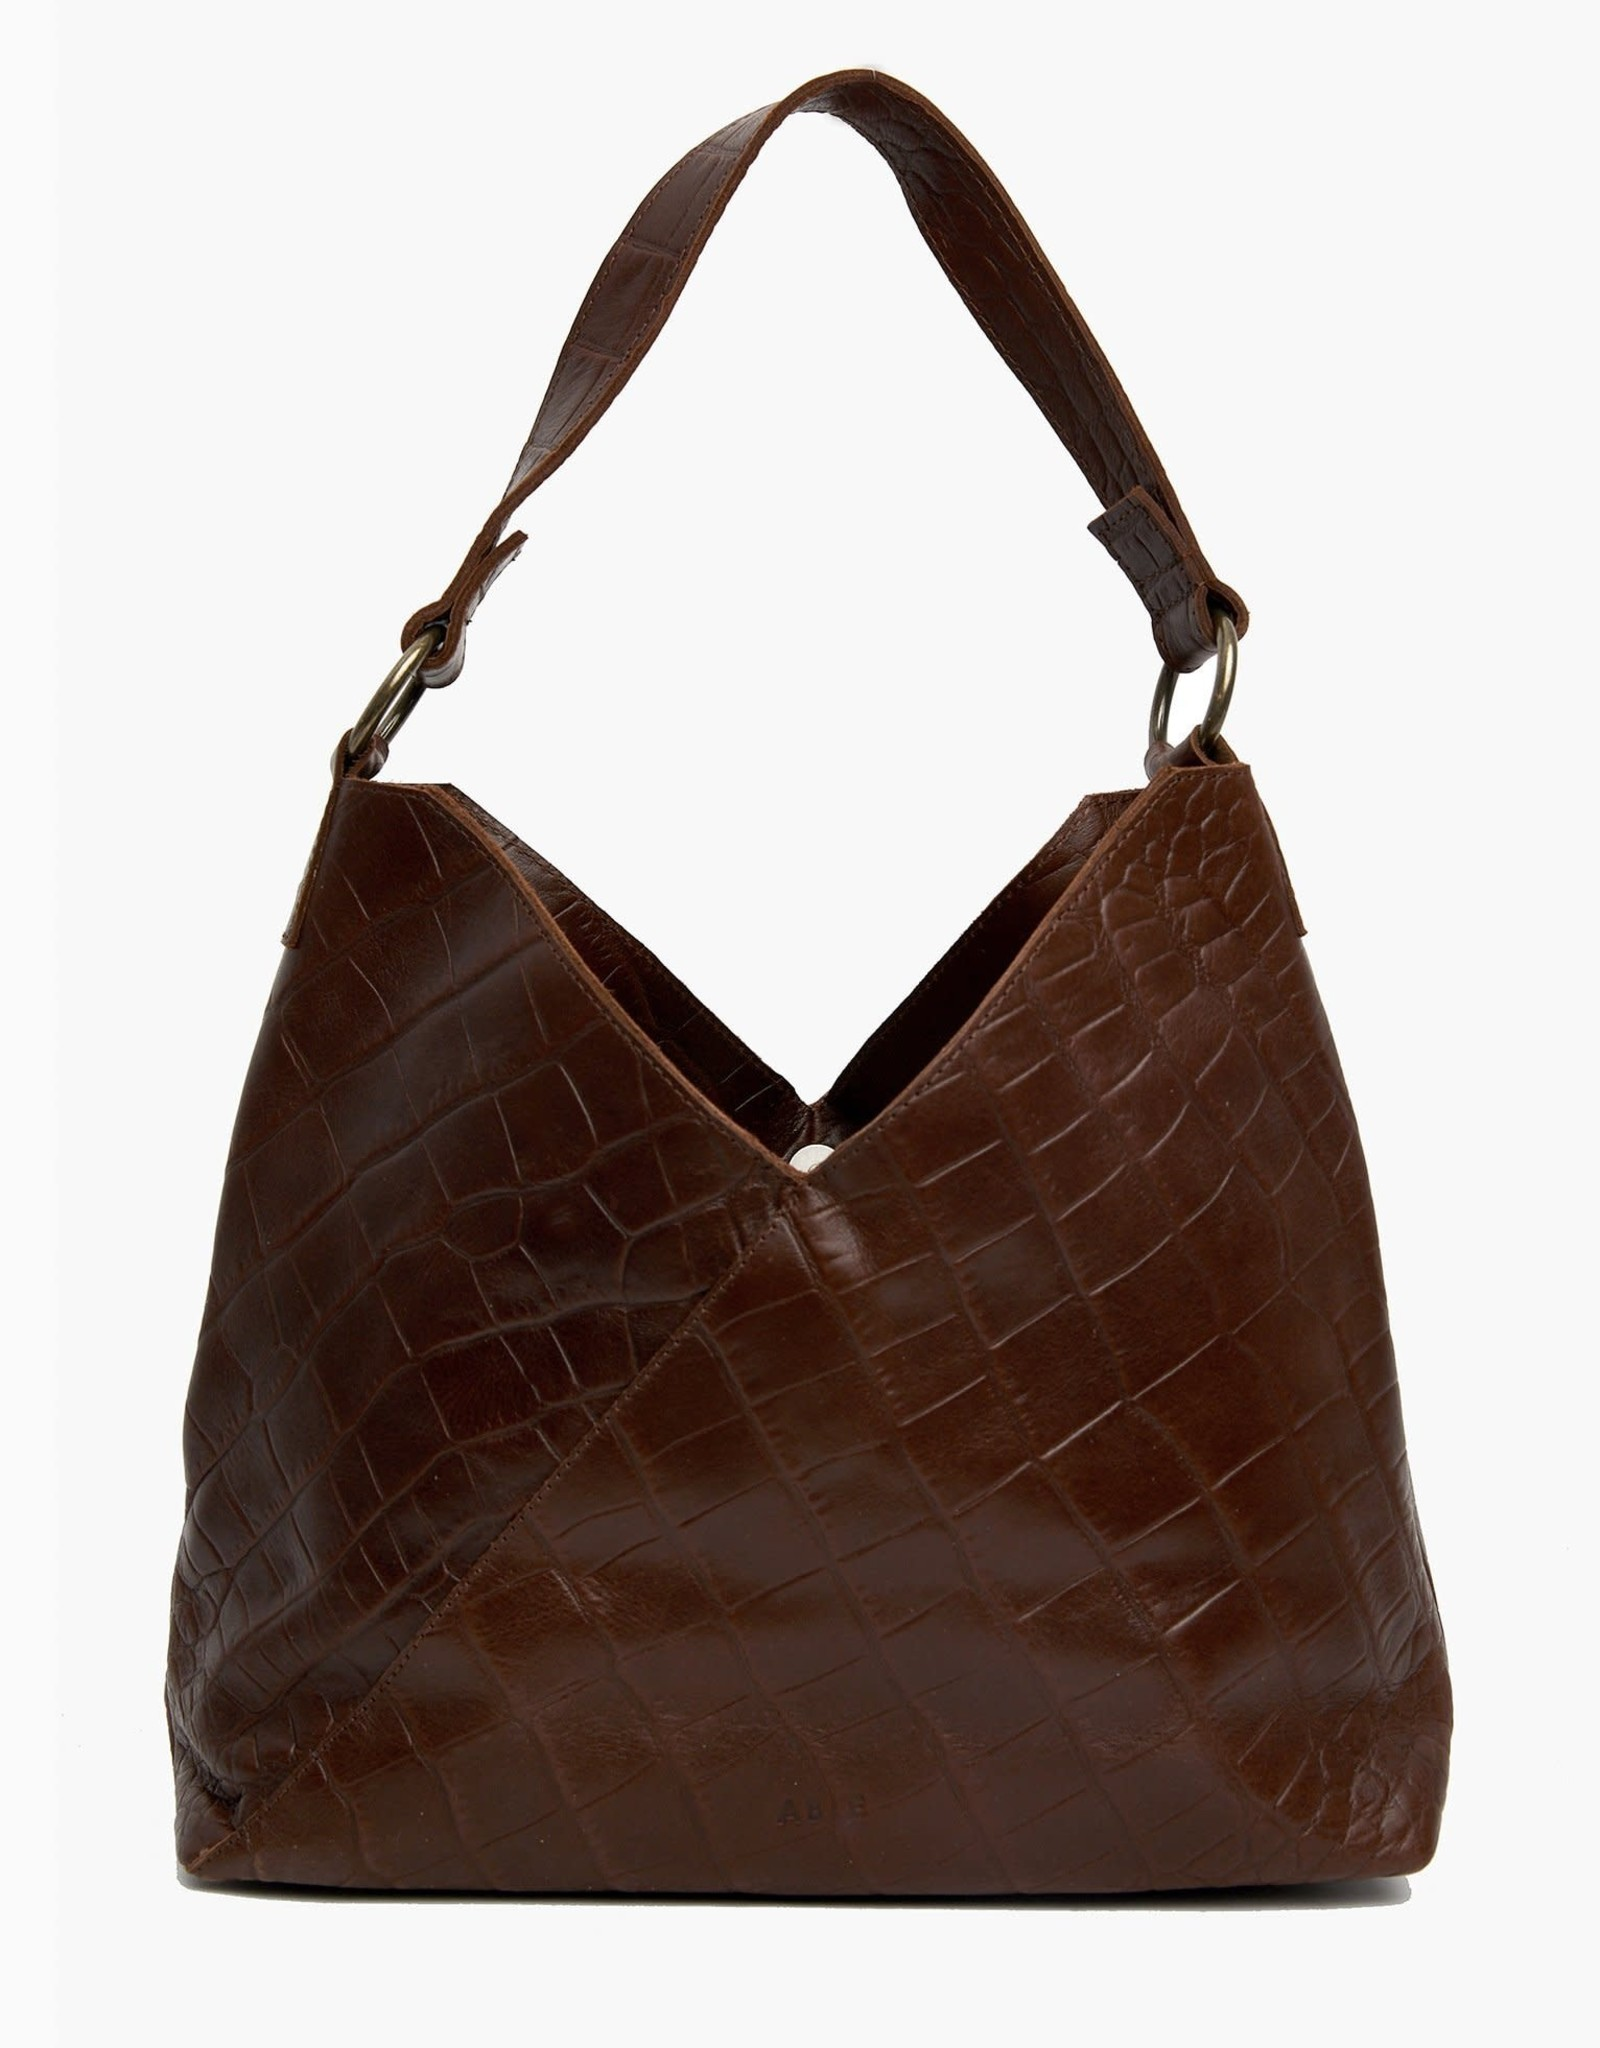 FashionABLE ABLE Solome Shoulderbag- Chocolate Croco